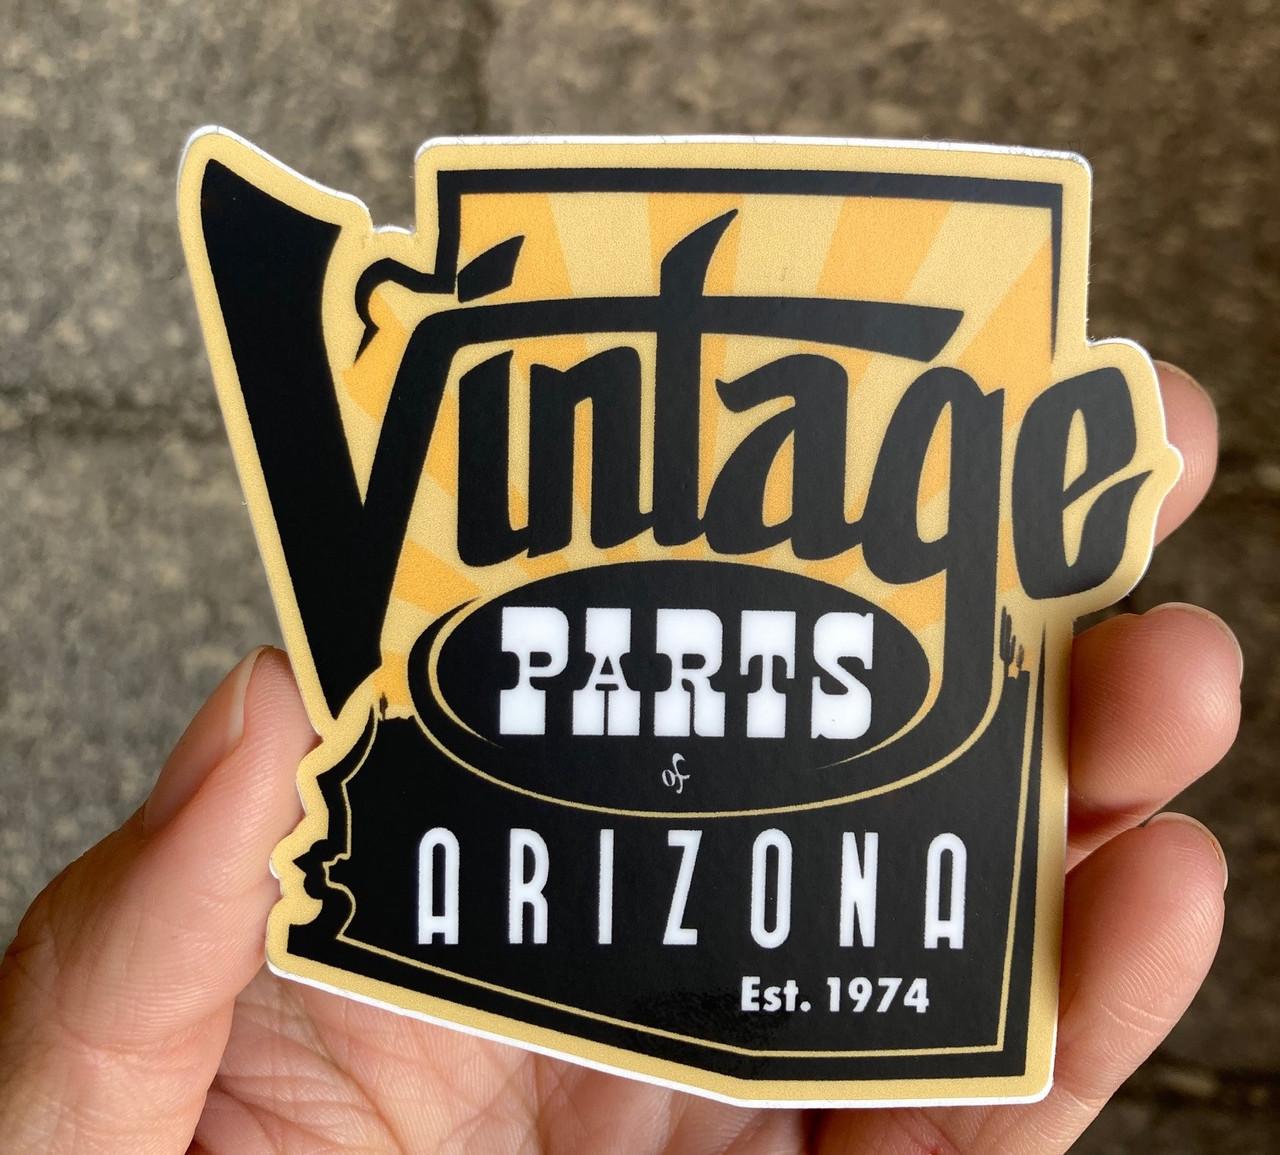 Vintage Parts of Arizona LOGO Sticker